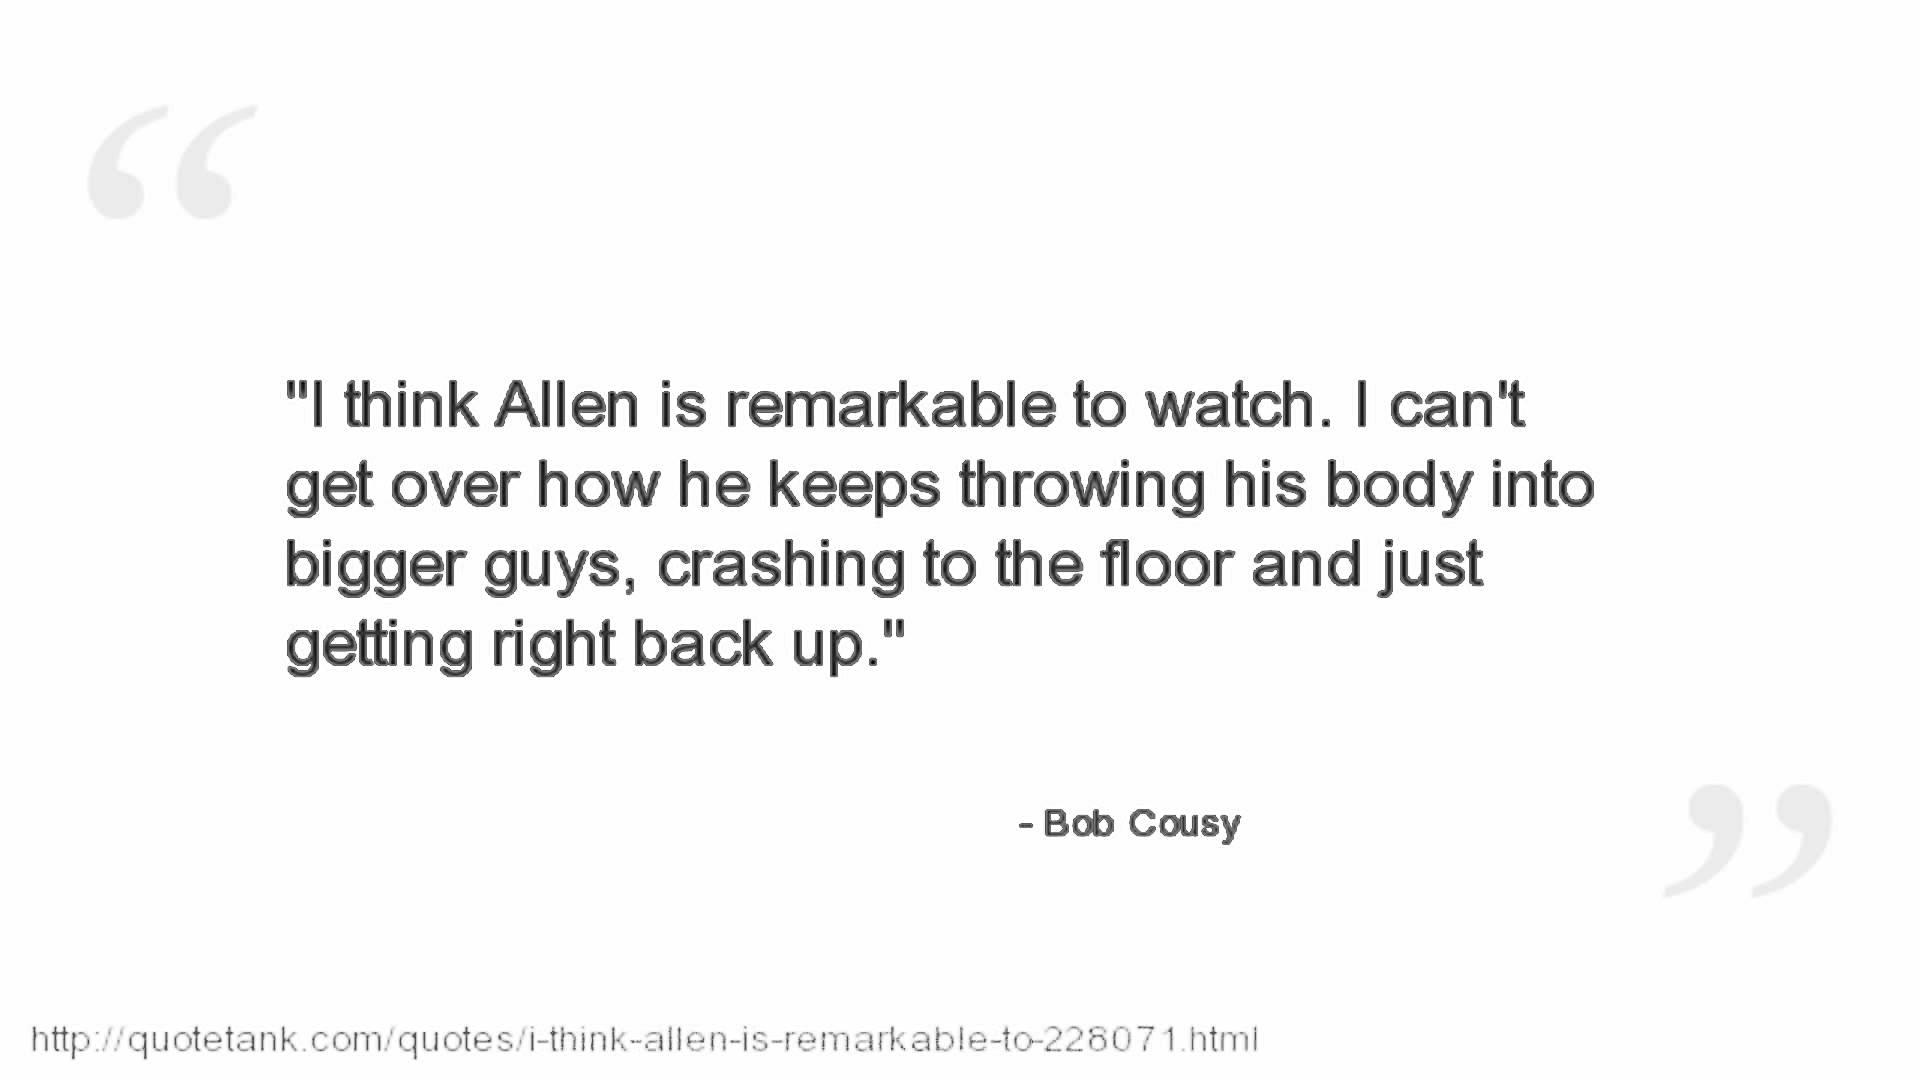 Bob Cousy's quote #5